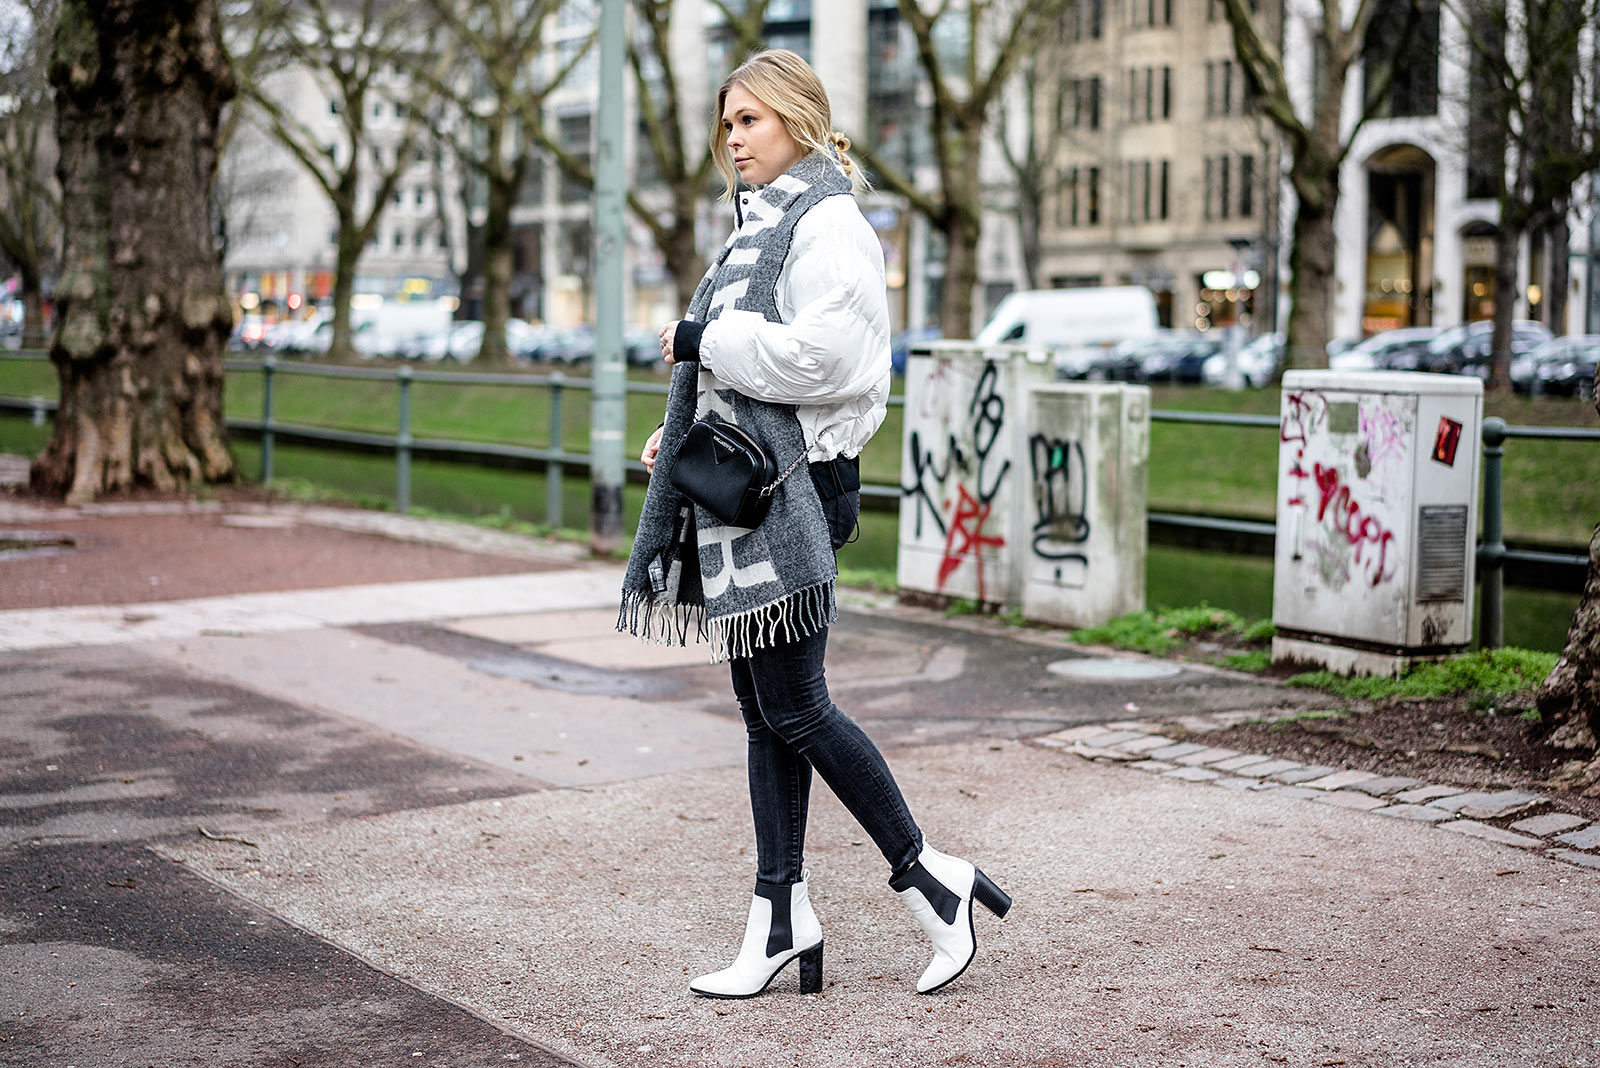 Boots Daunenjacke weiss Outfit Statement Schal Modeblog Sunnyinga